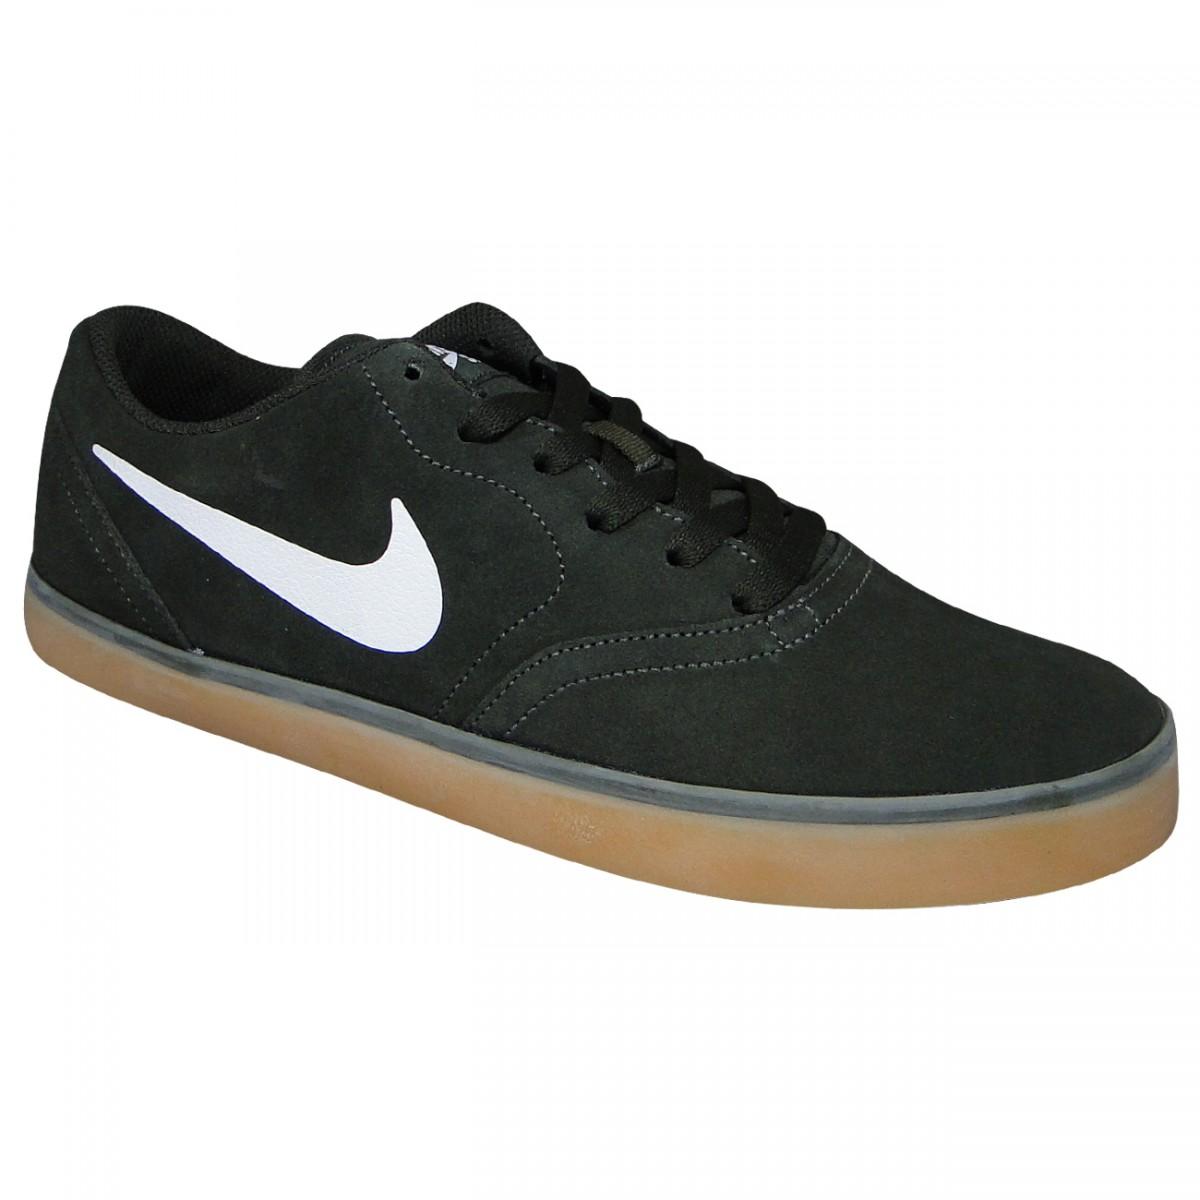 663af4dbfc1 Tenis Nike SB Check 705265 312 - Musgo Natural - Chuteira Nike ...